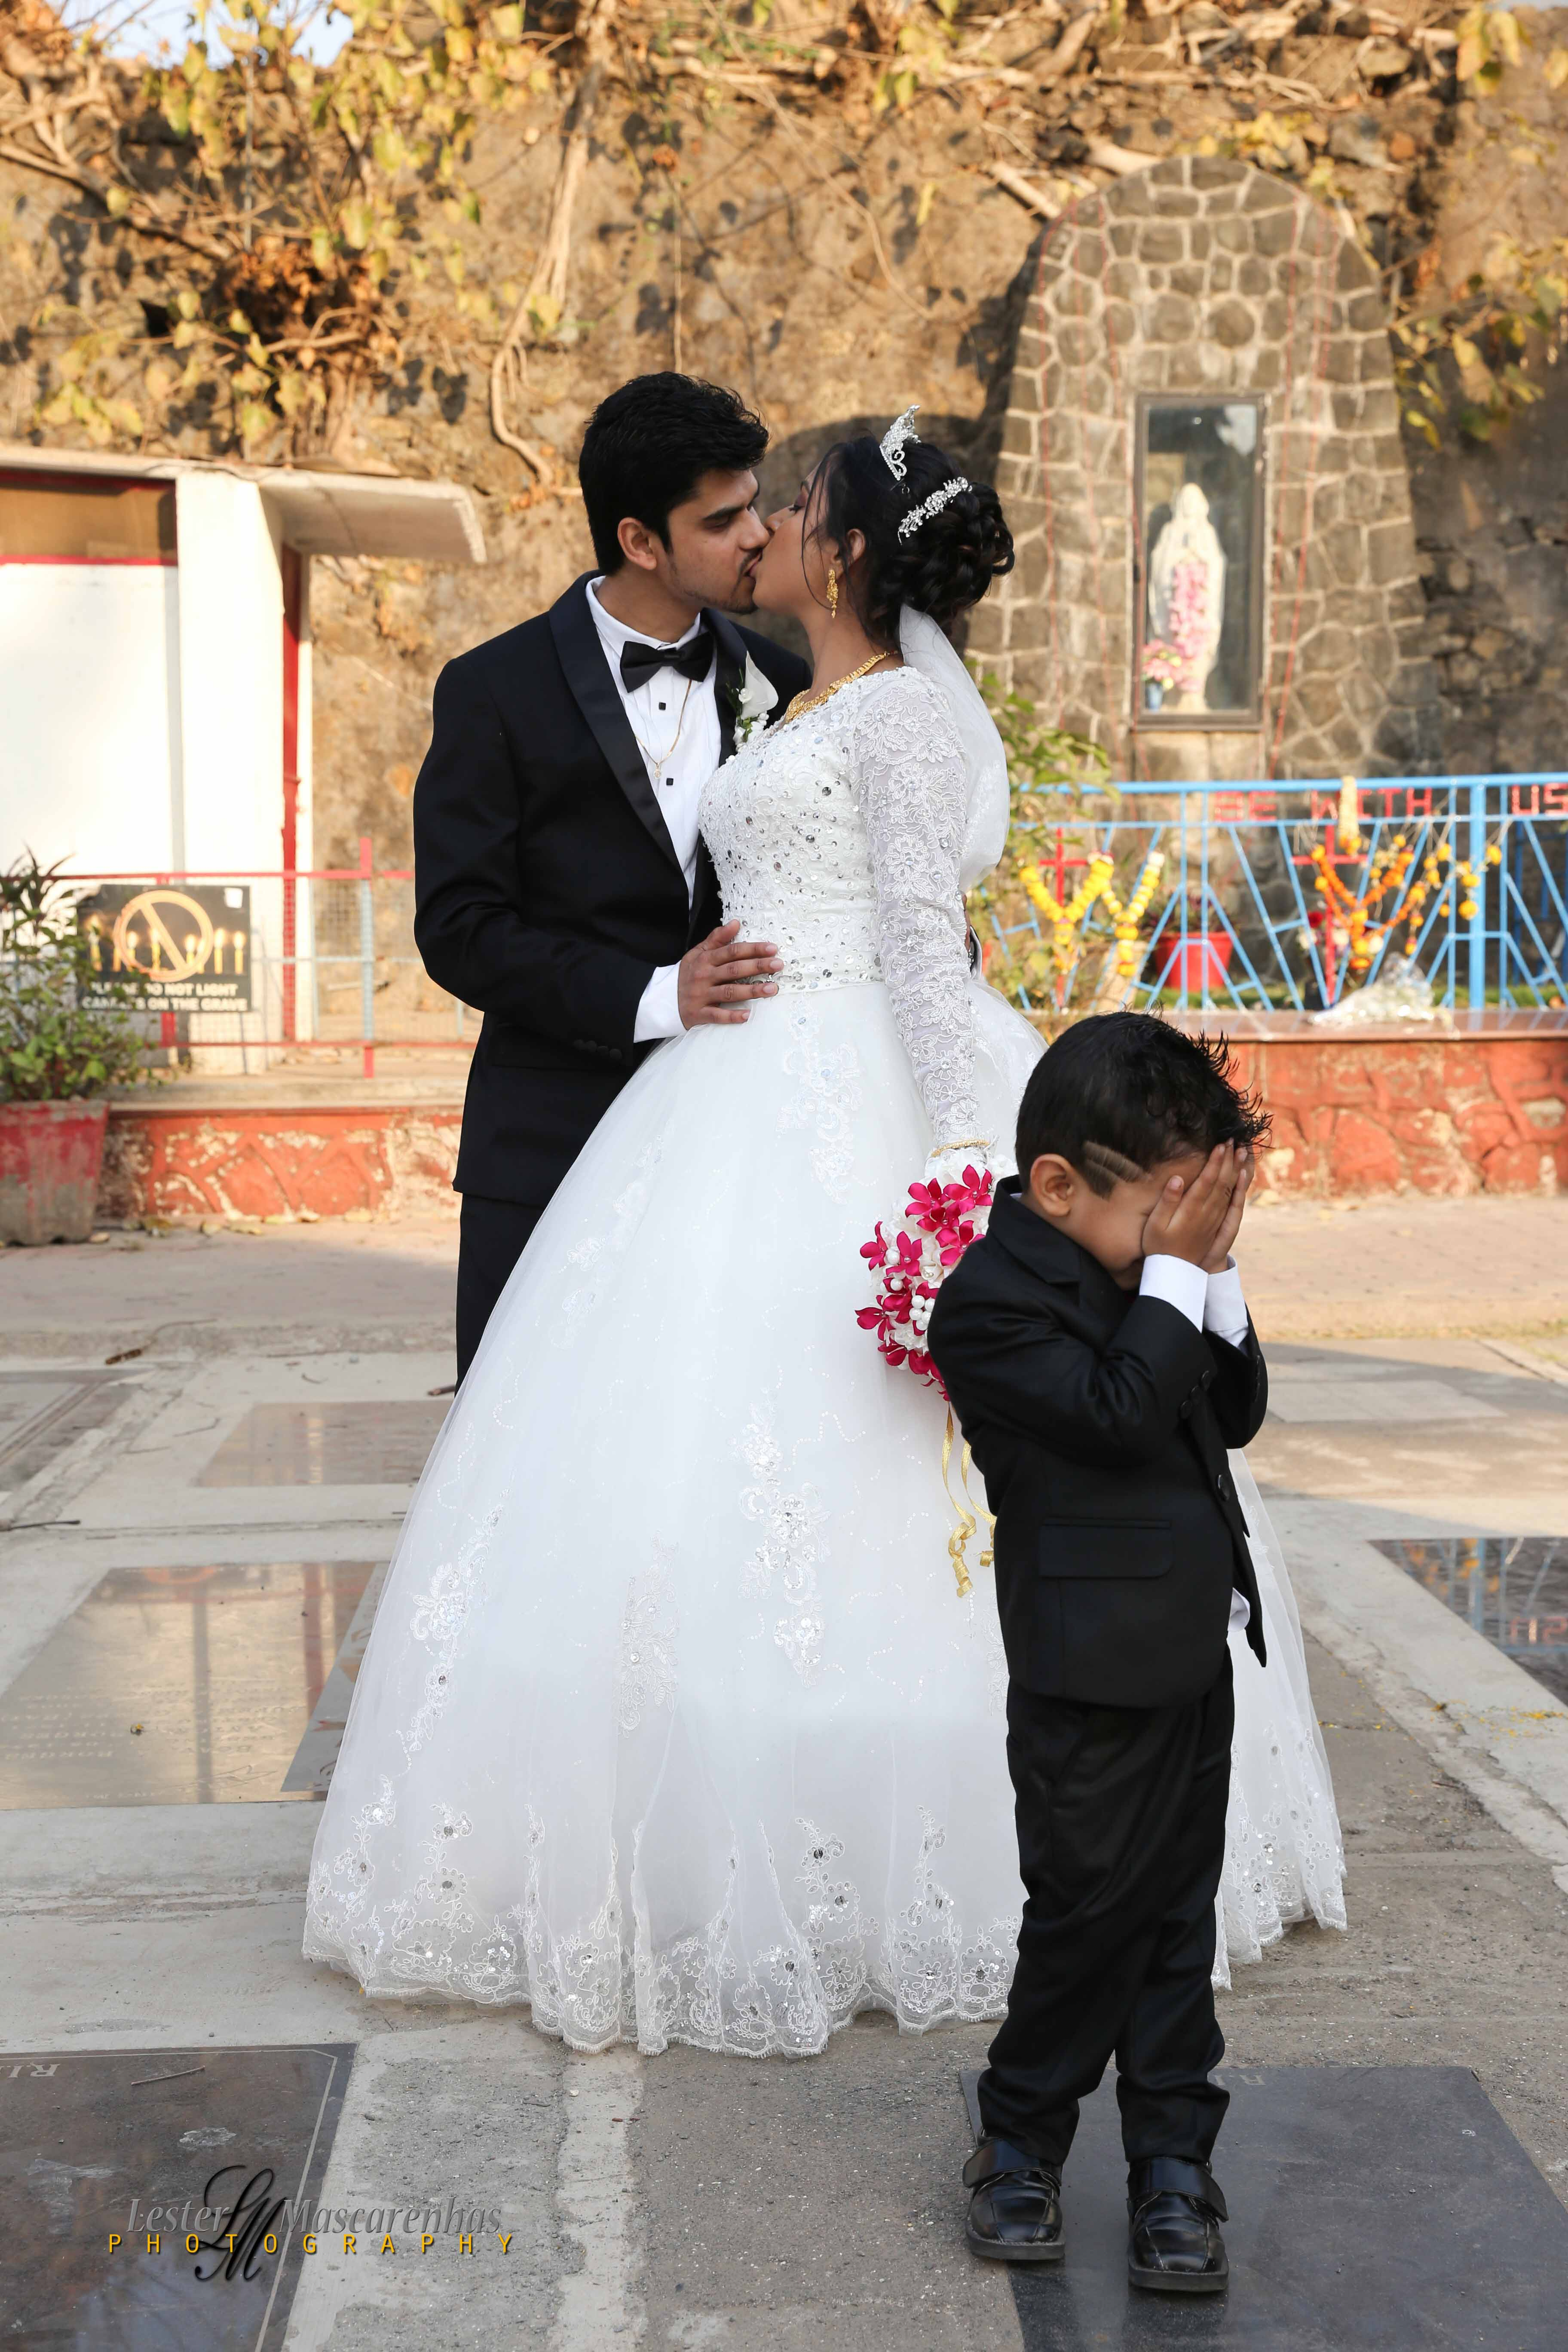 Shweta & Daniel's Wedding Ceremony